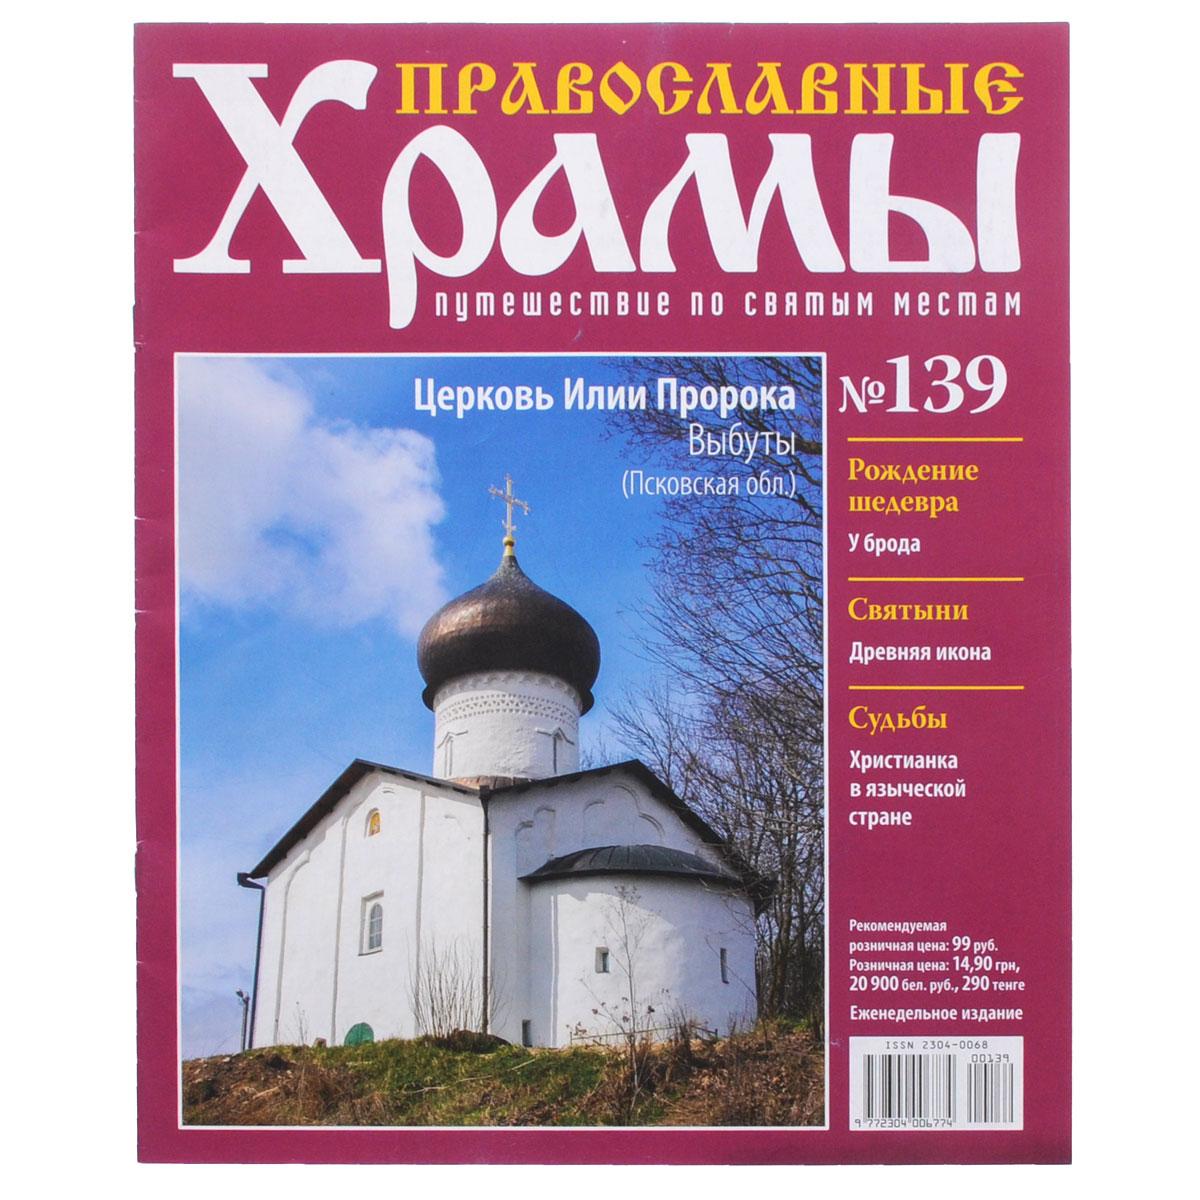 Журнал Православные храмы. Путешествие по святым местам № 139 2953s 95 4n